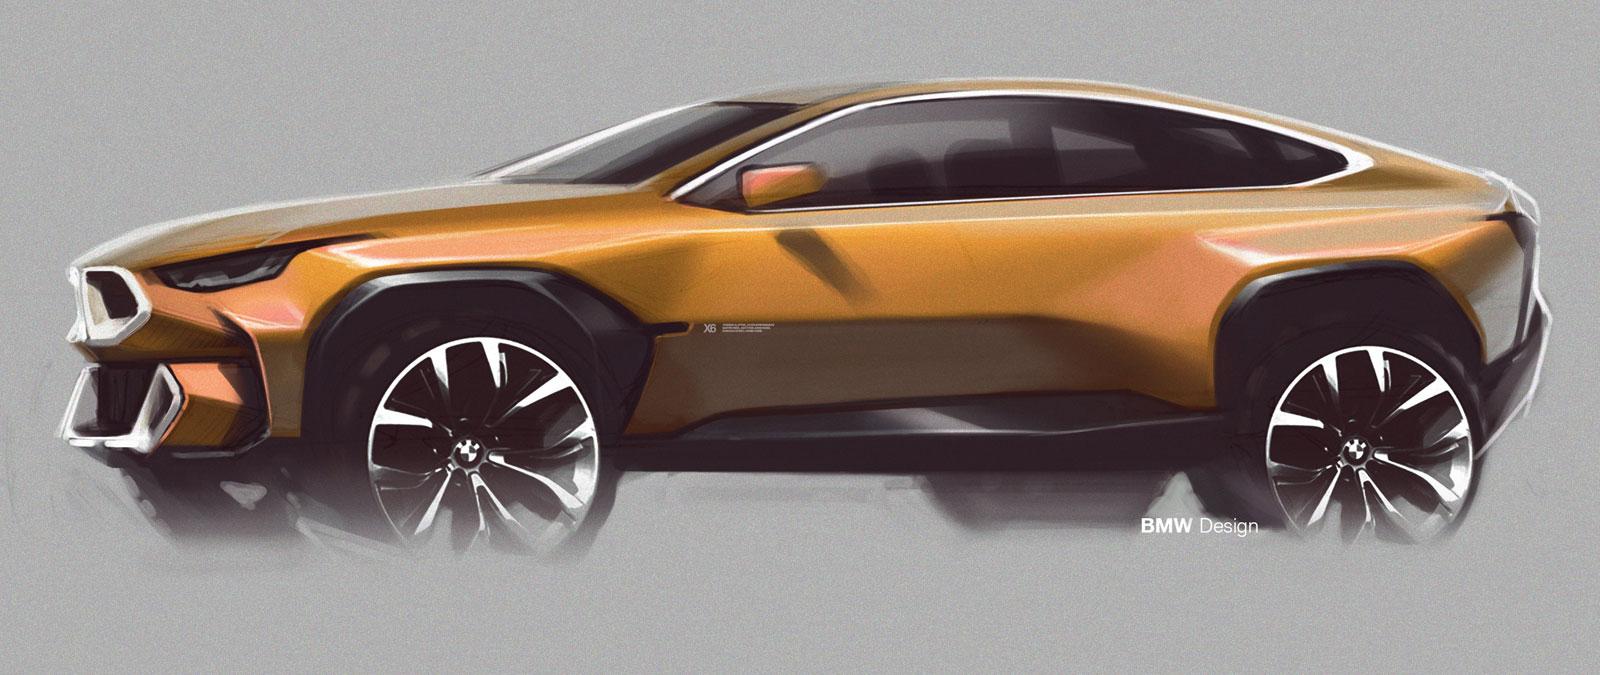 New Bmw X6 Design Sketch Car Body Design